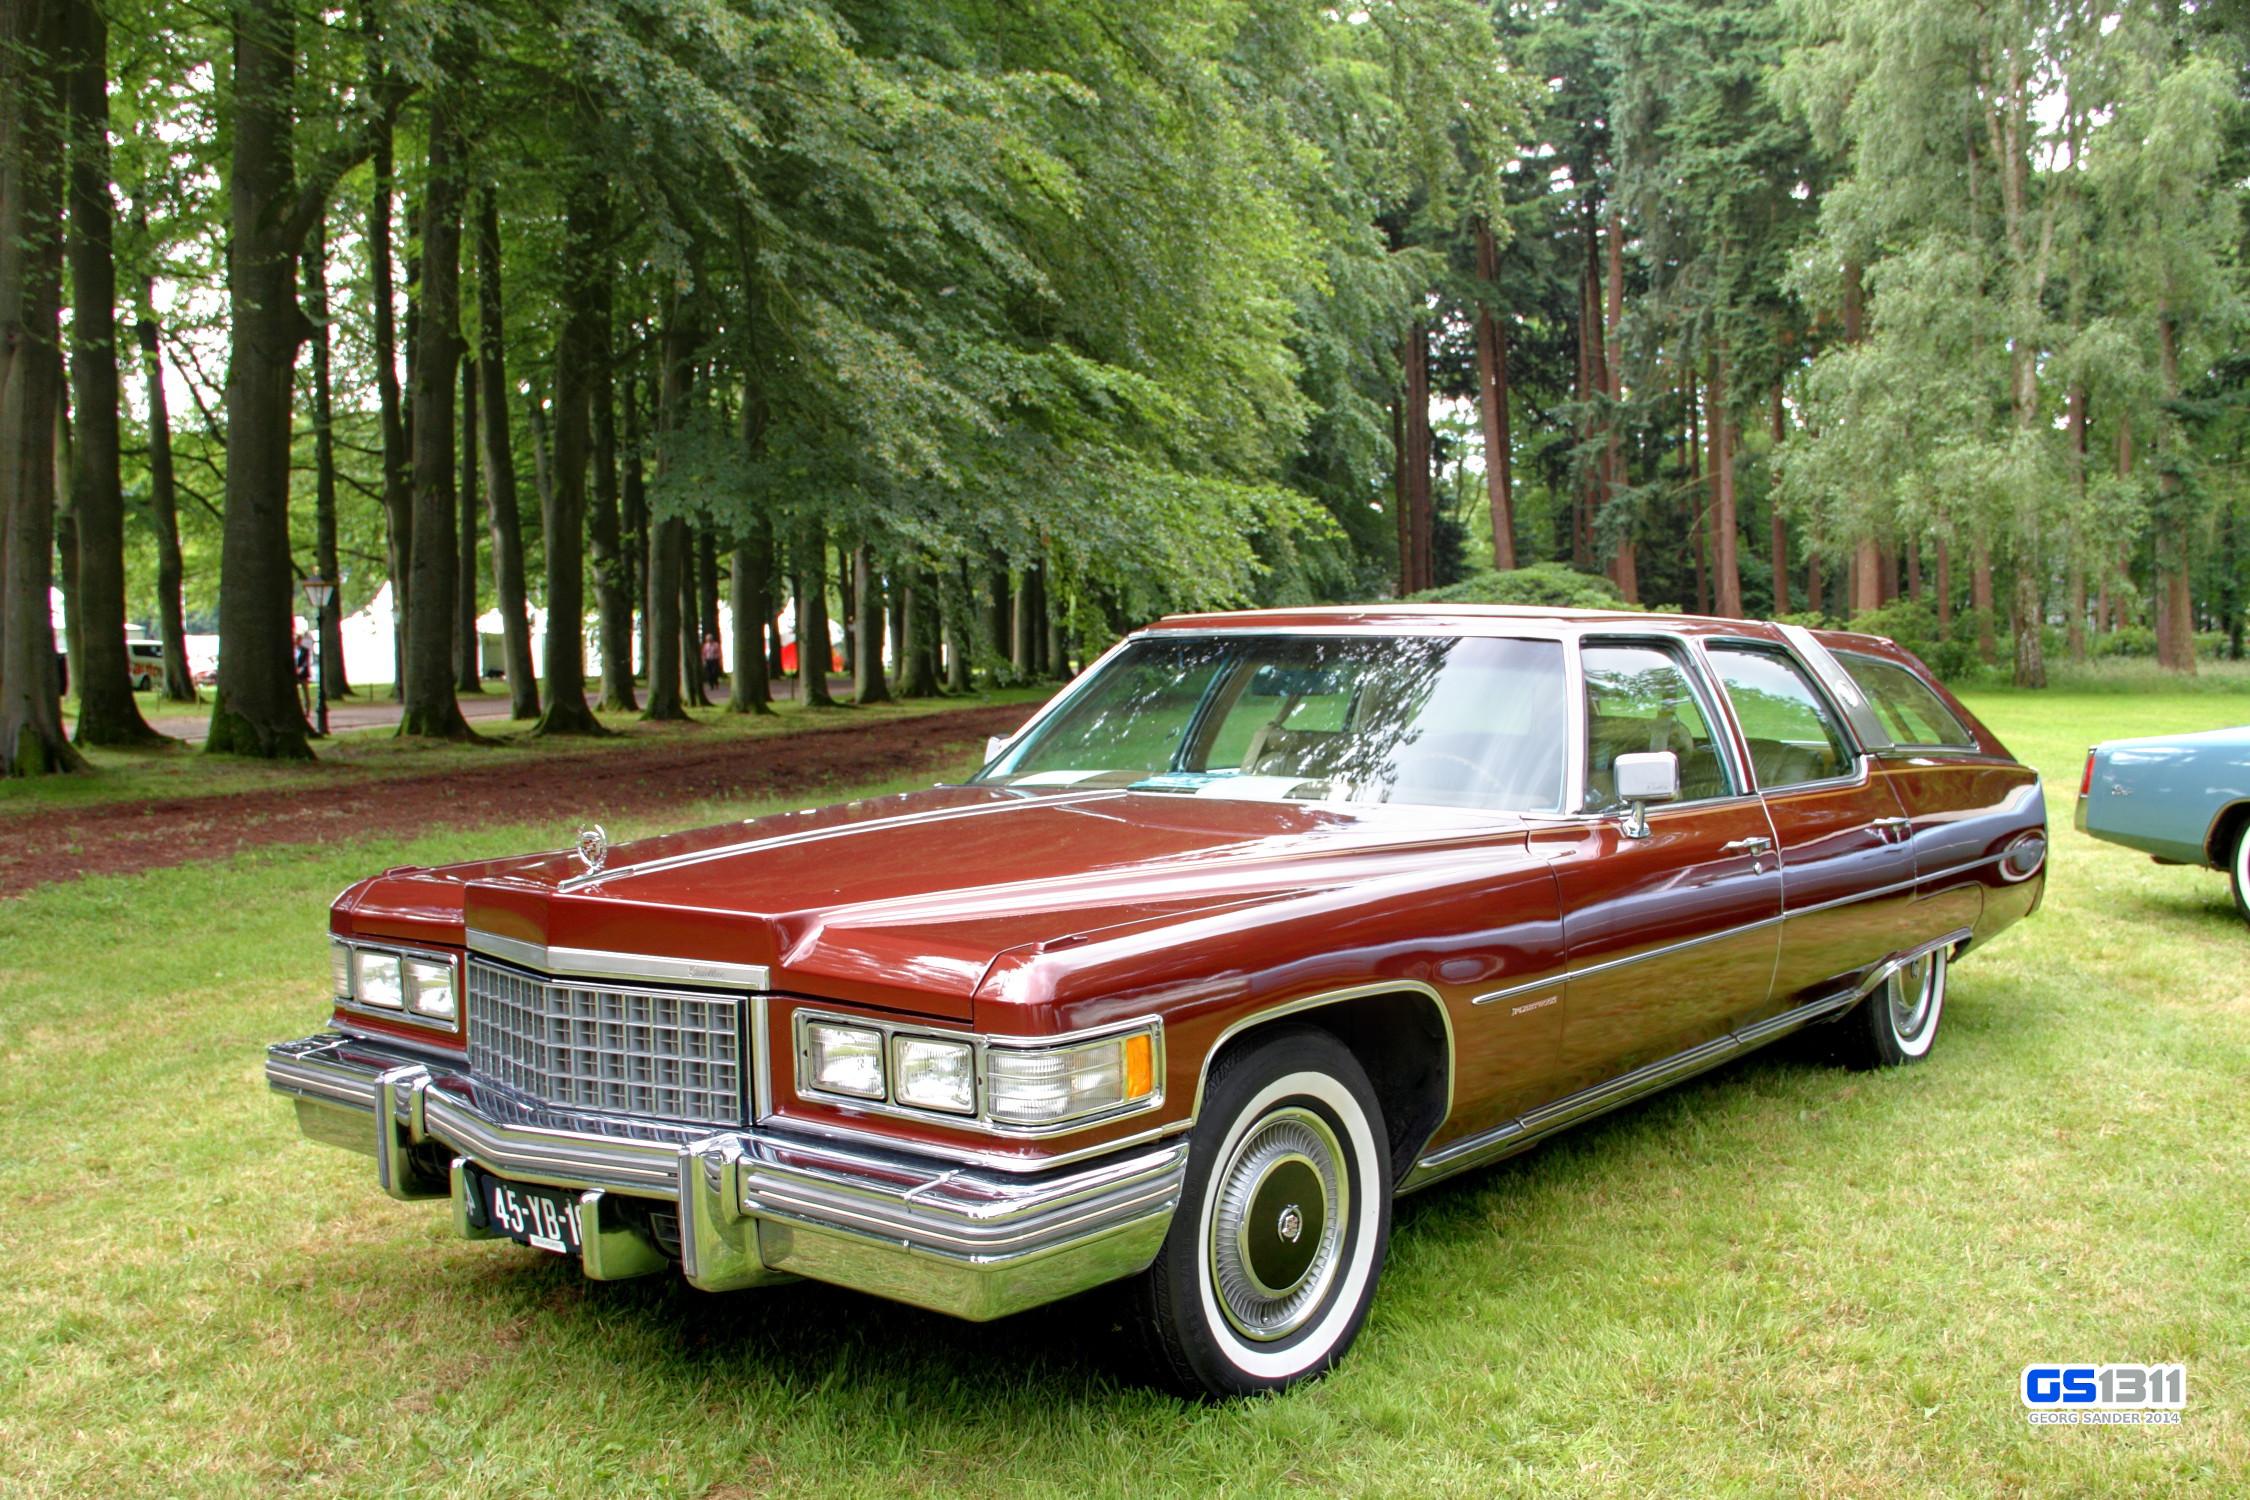 Wallpaper : old, classic car, Cadillac, Oldtimer, performance car ...